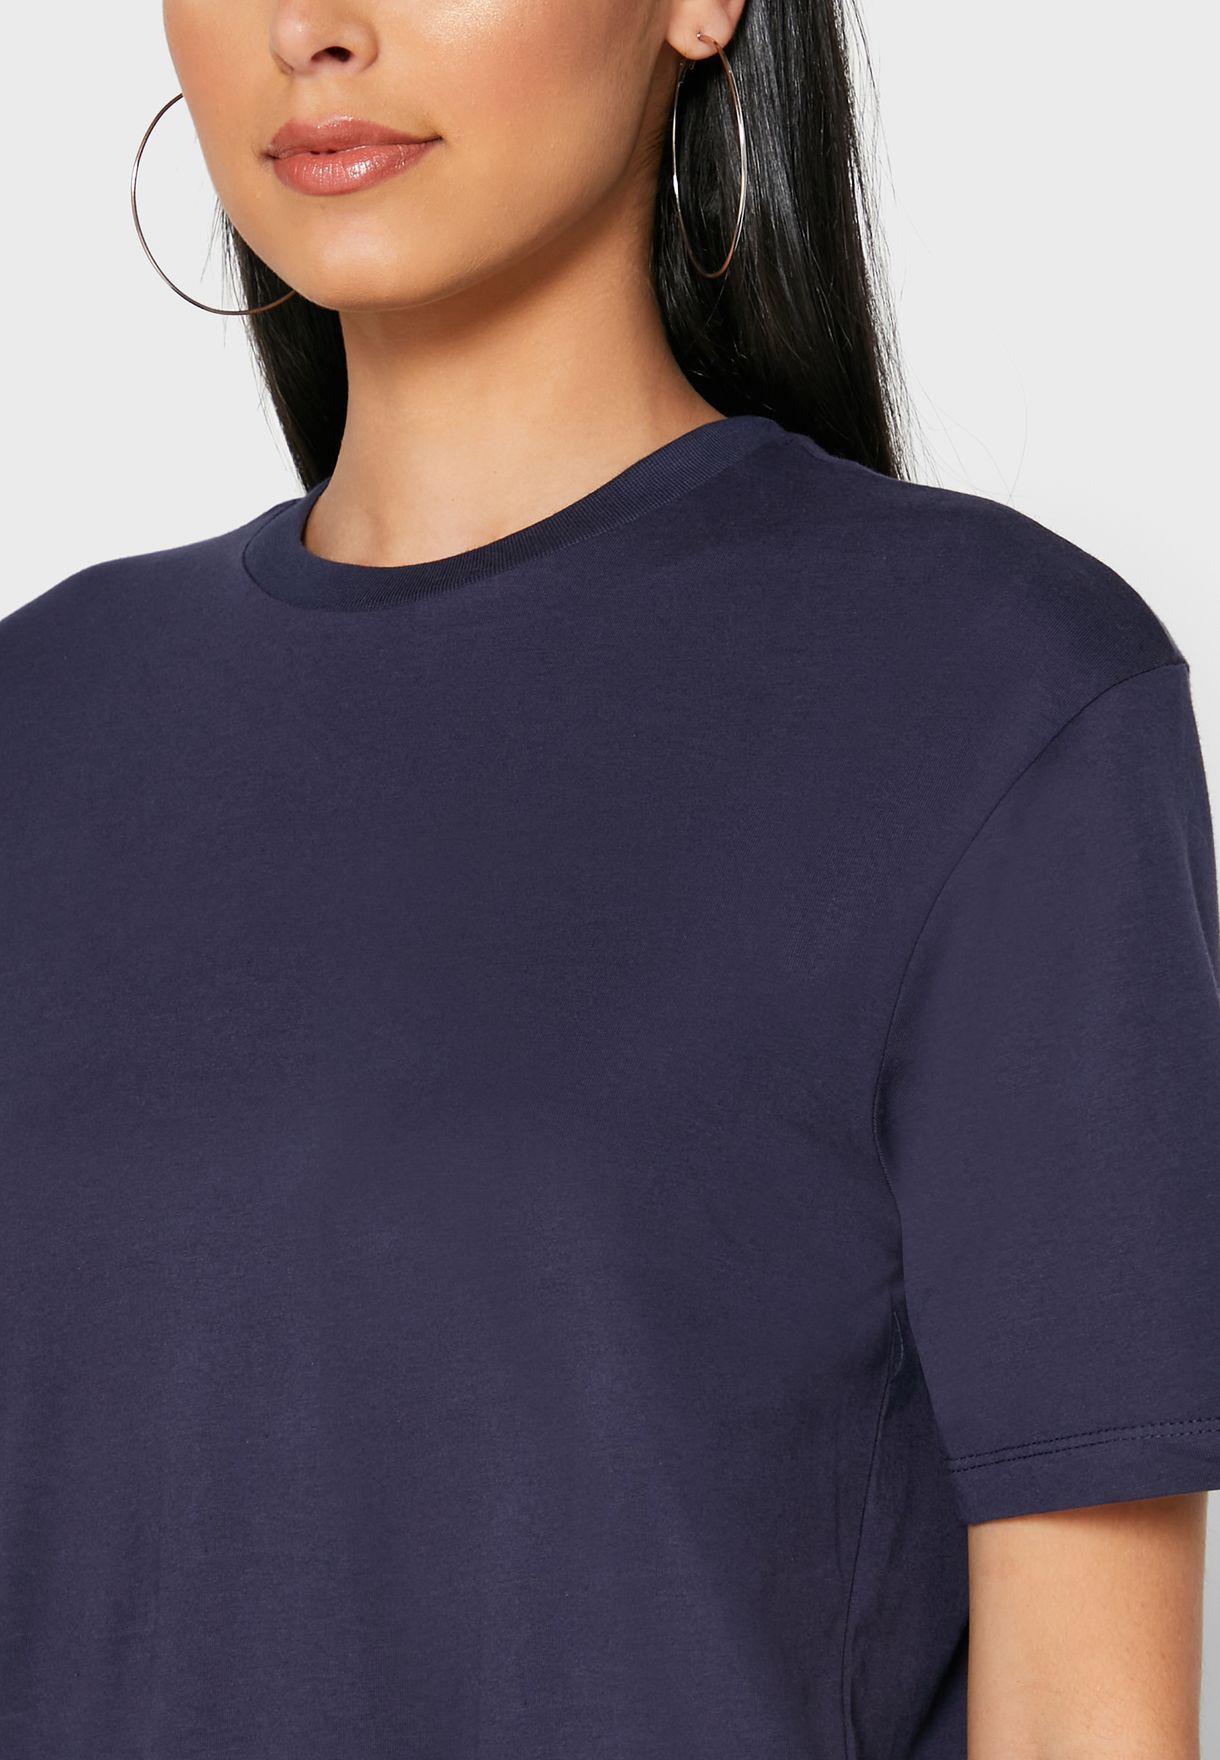 Oversized Graphic Back T-Shirt